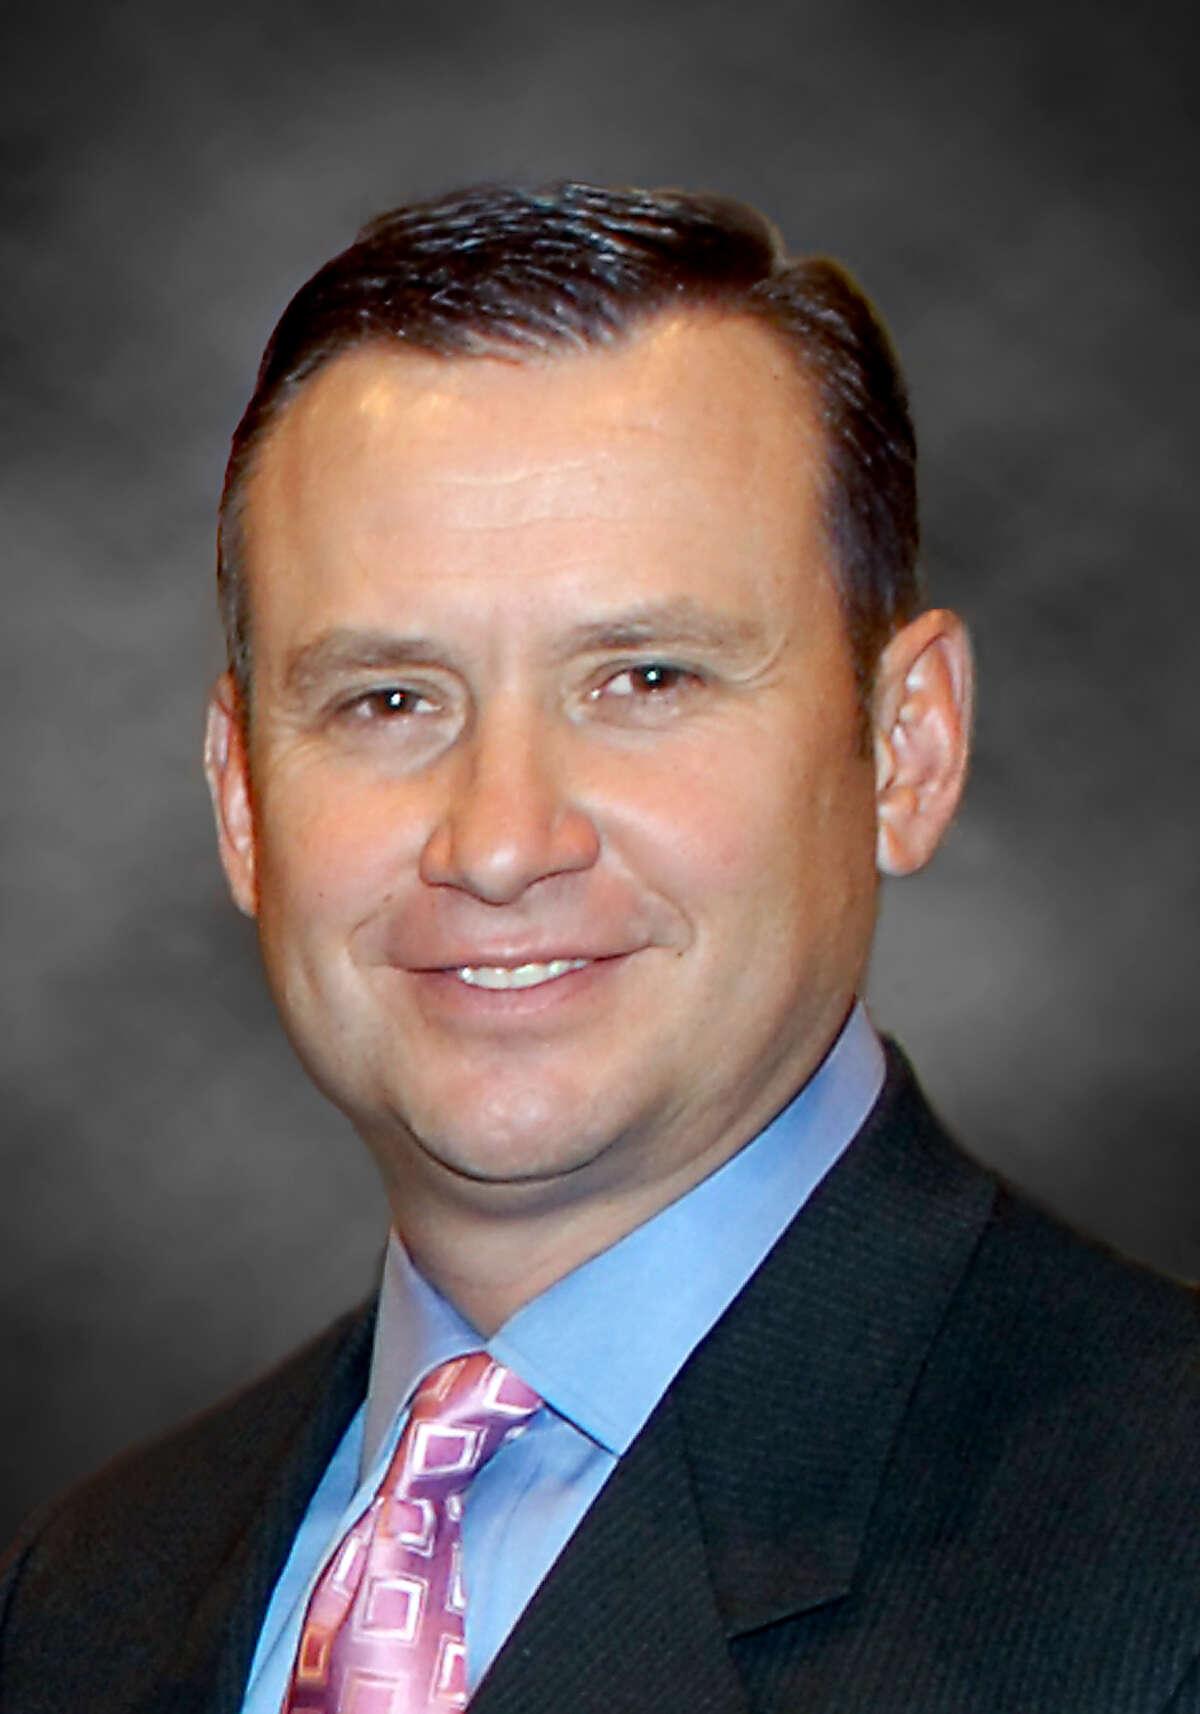 Scott Grimmett